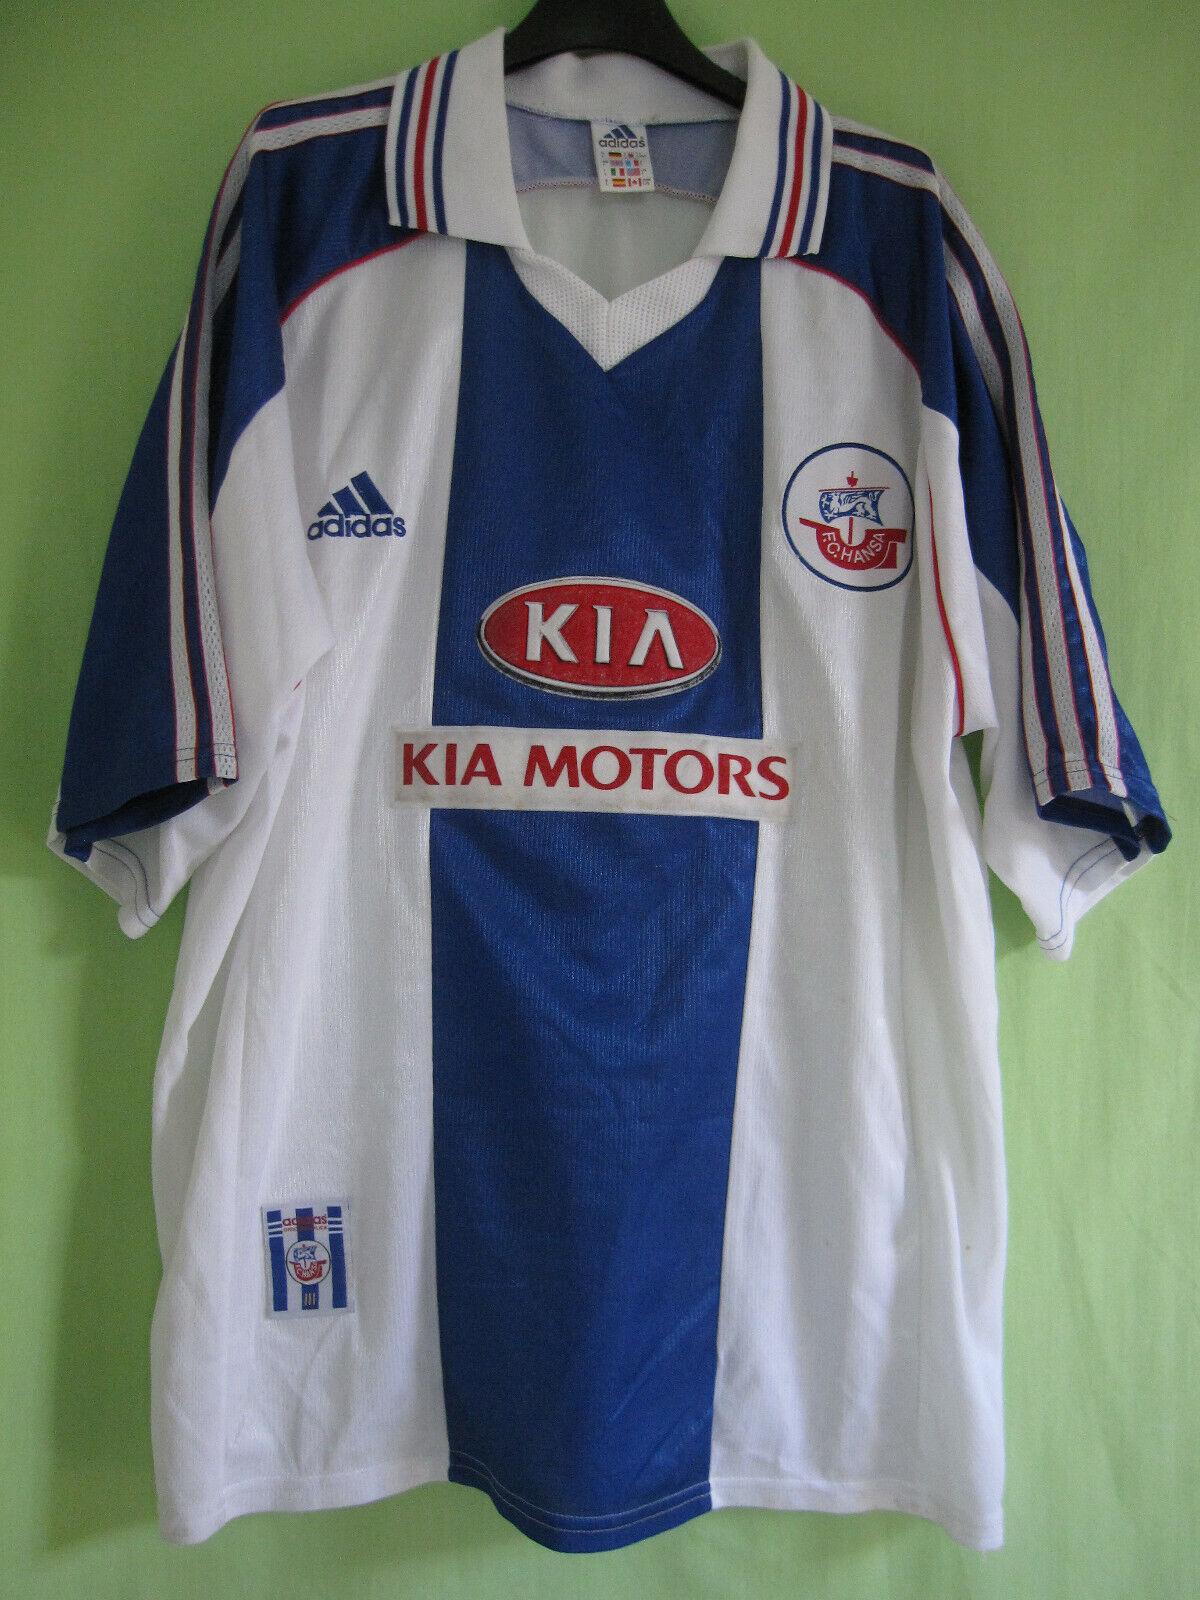 Maillot Hansa Rostock Fc Adidas Kia Motors vintage 1999 2000 Jersey